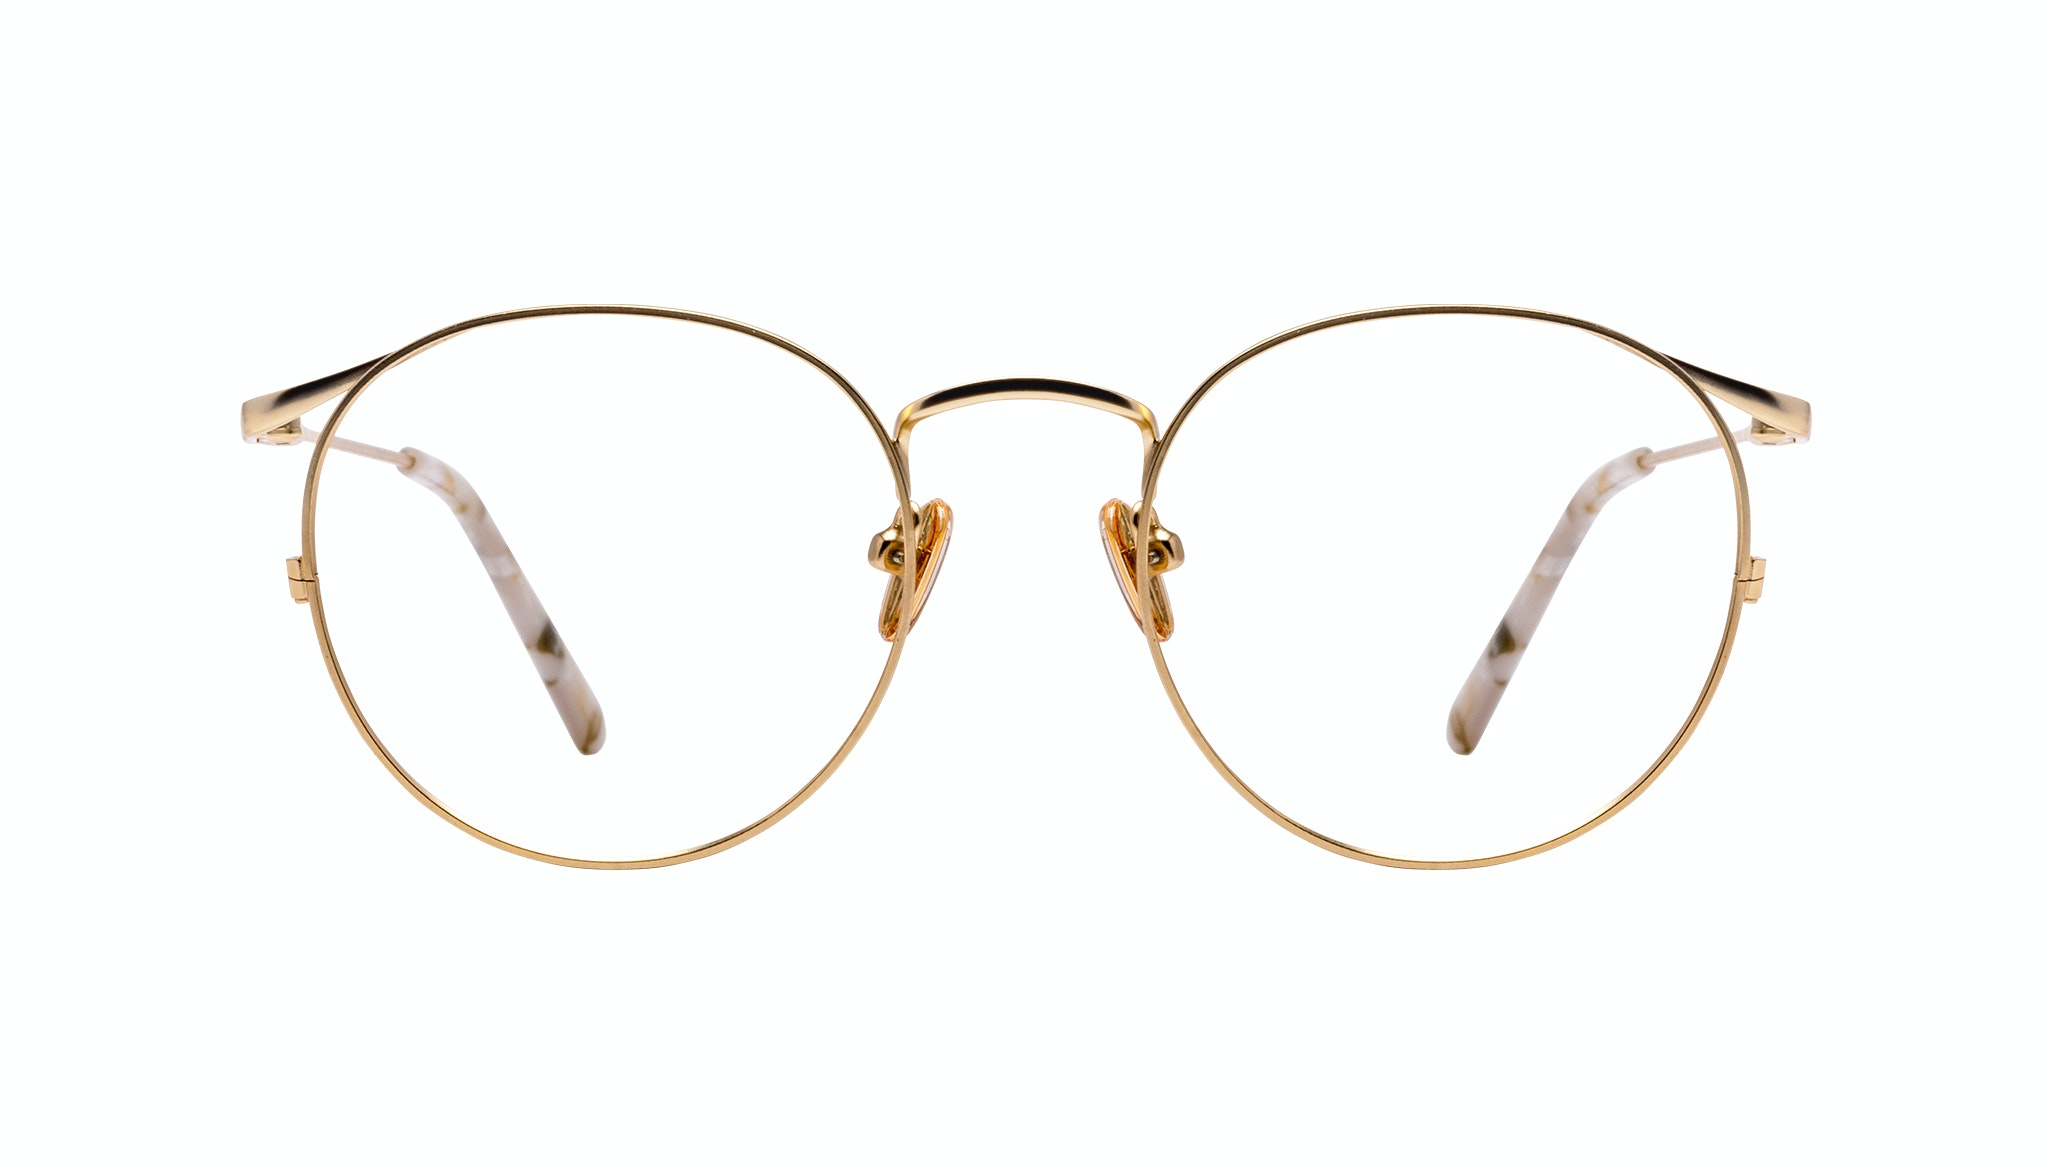 Affordable Fashion Glasses Round Eyeglasses Women Curve Gold